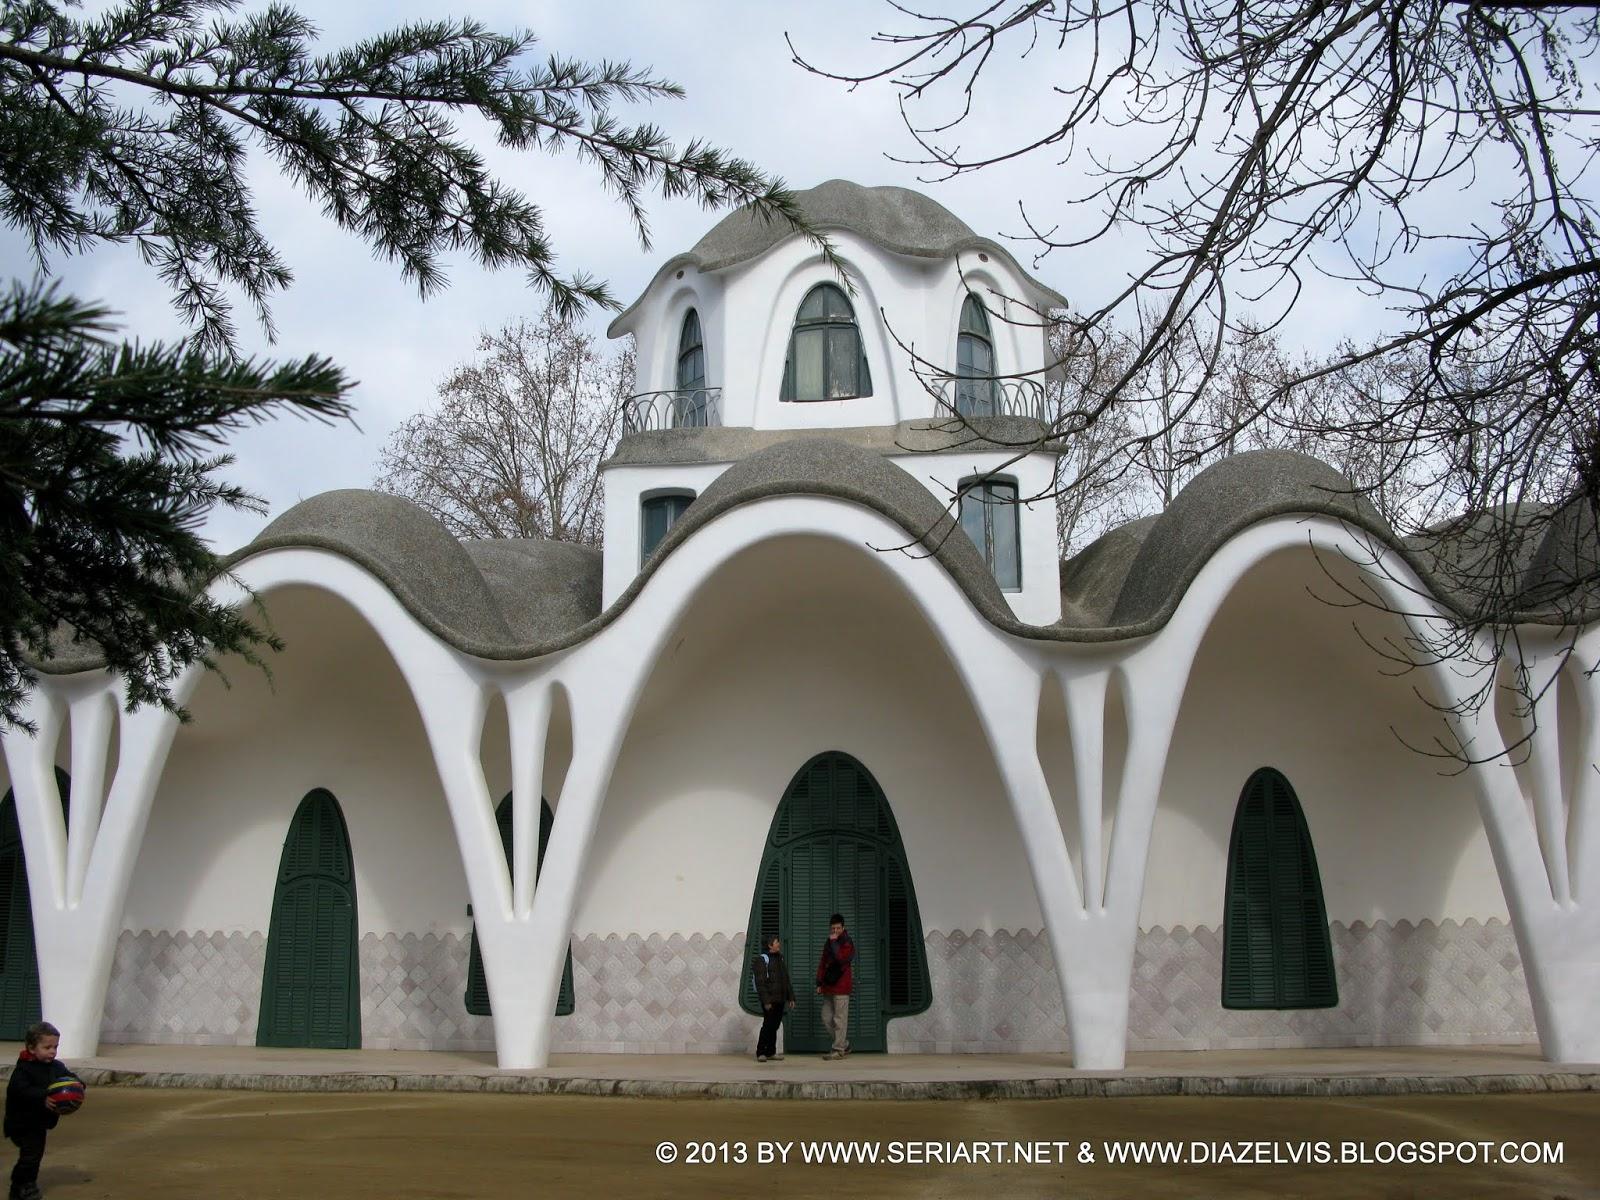 Paseo chimenea almirall parc sant jordi masia freixa - Masias en terrassa ...